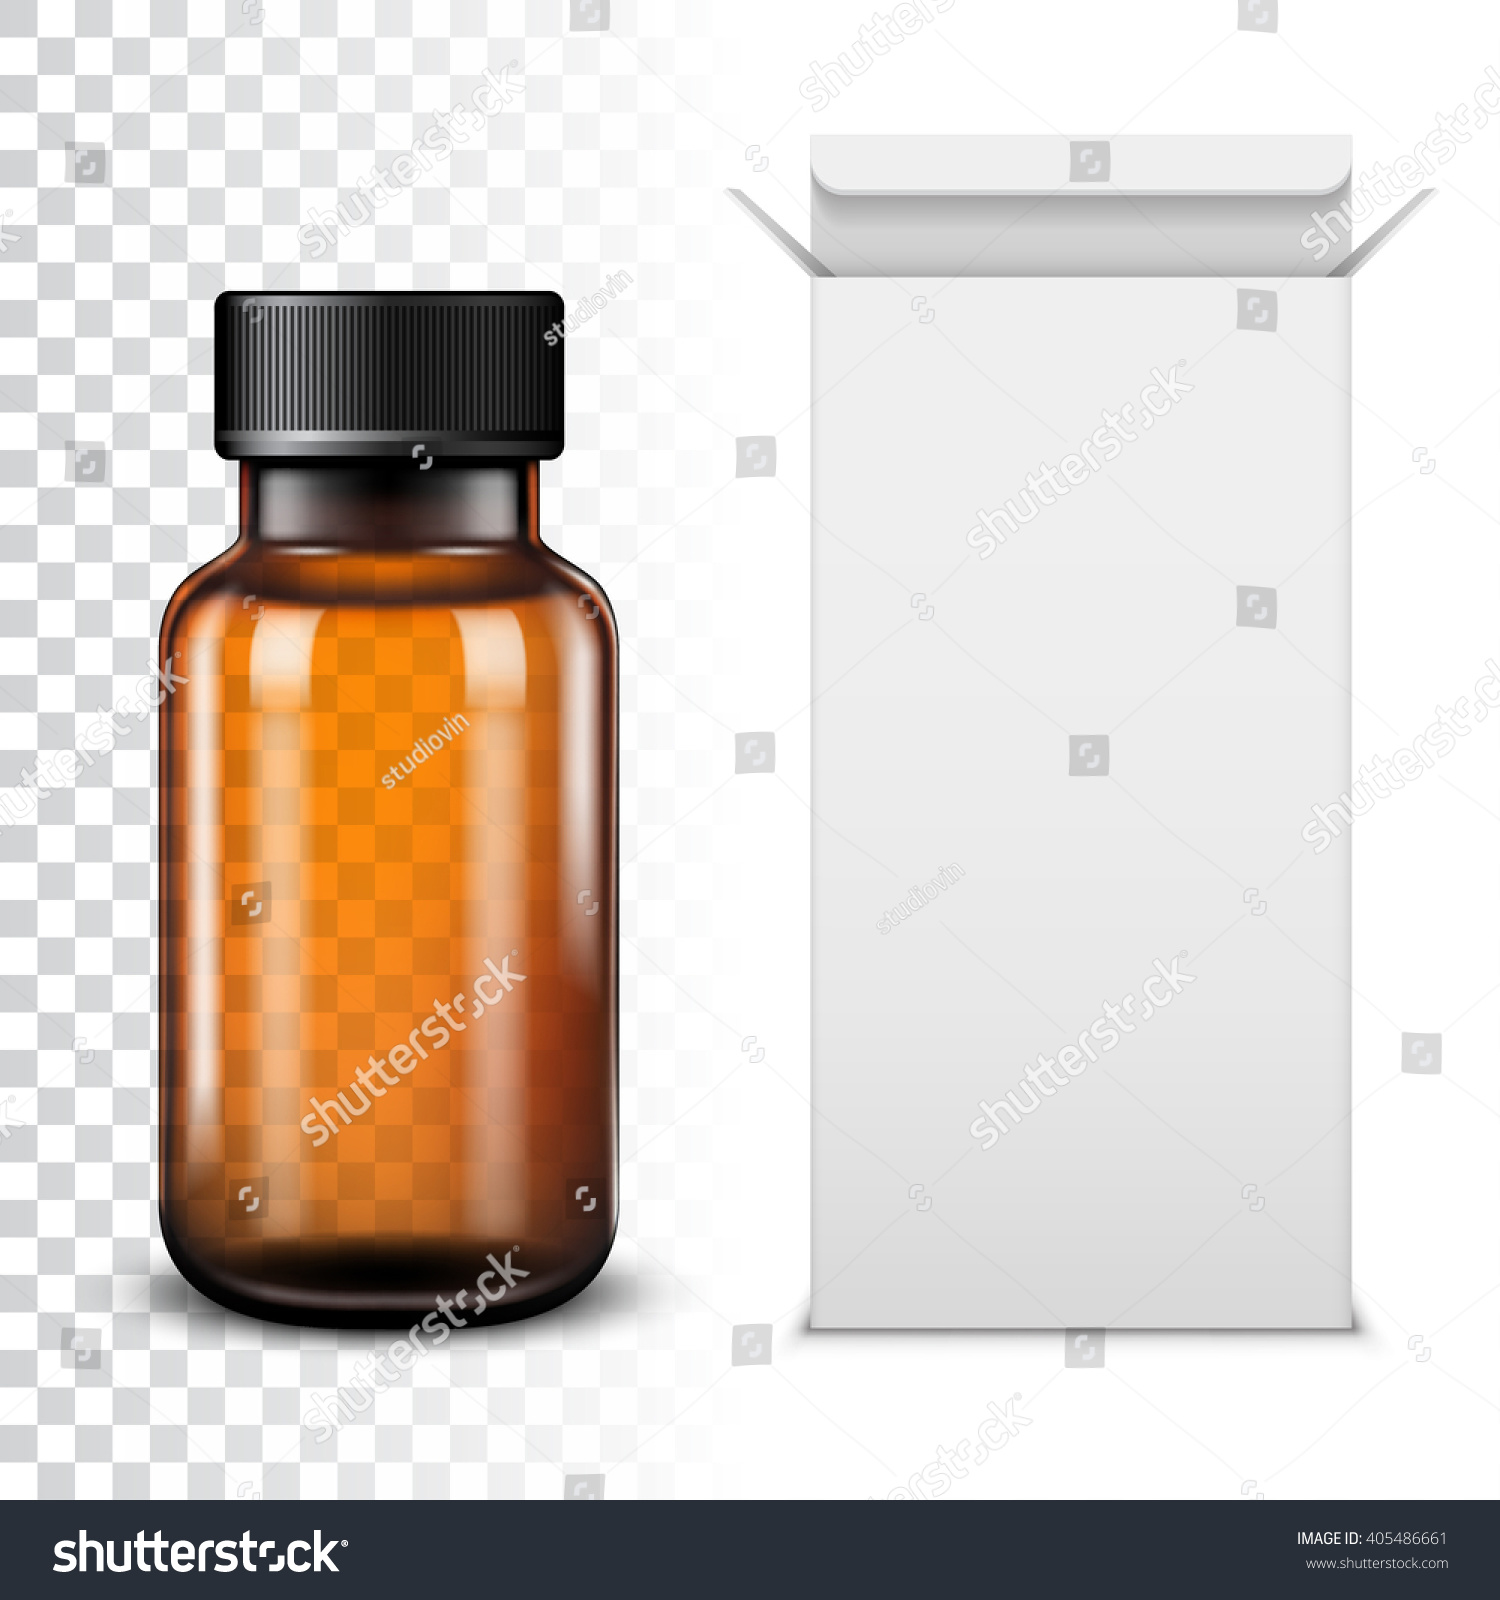 Template Empty Transparent Glass Bottle Vector Stock Vector ...